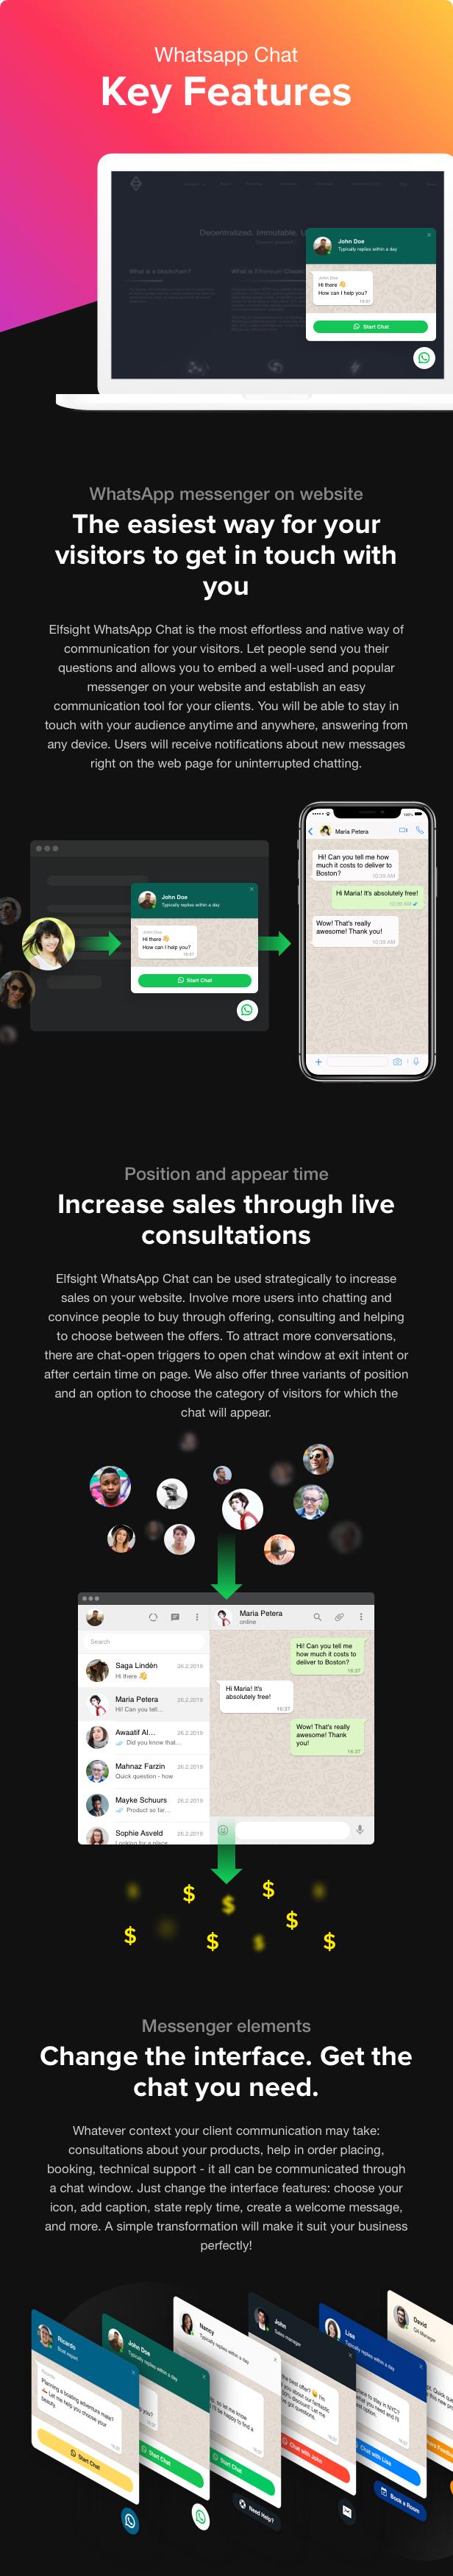 WhatsApp Chat - WordPress WhatsApp Chat - 1